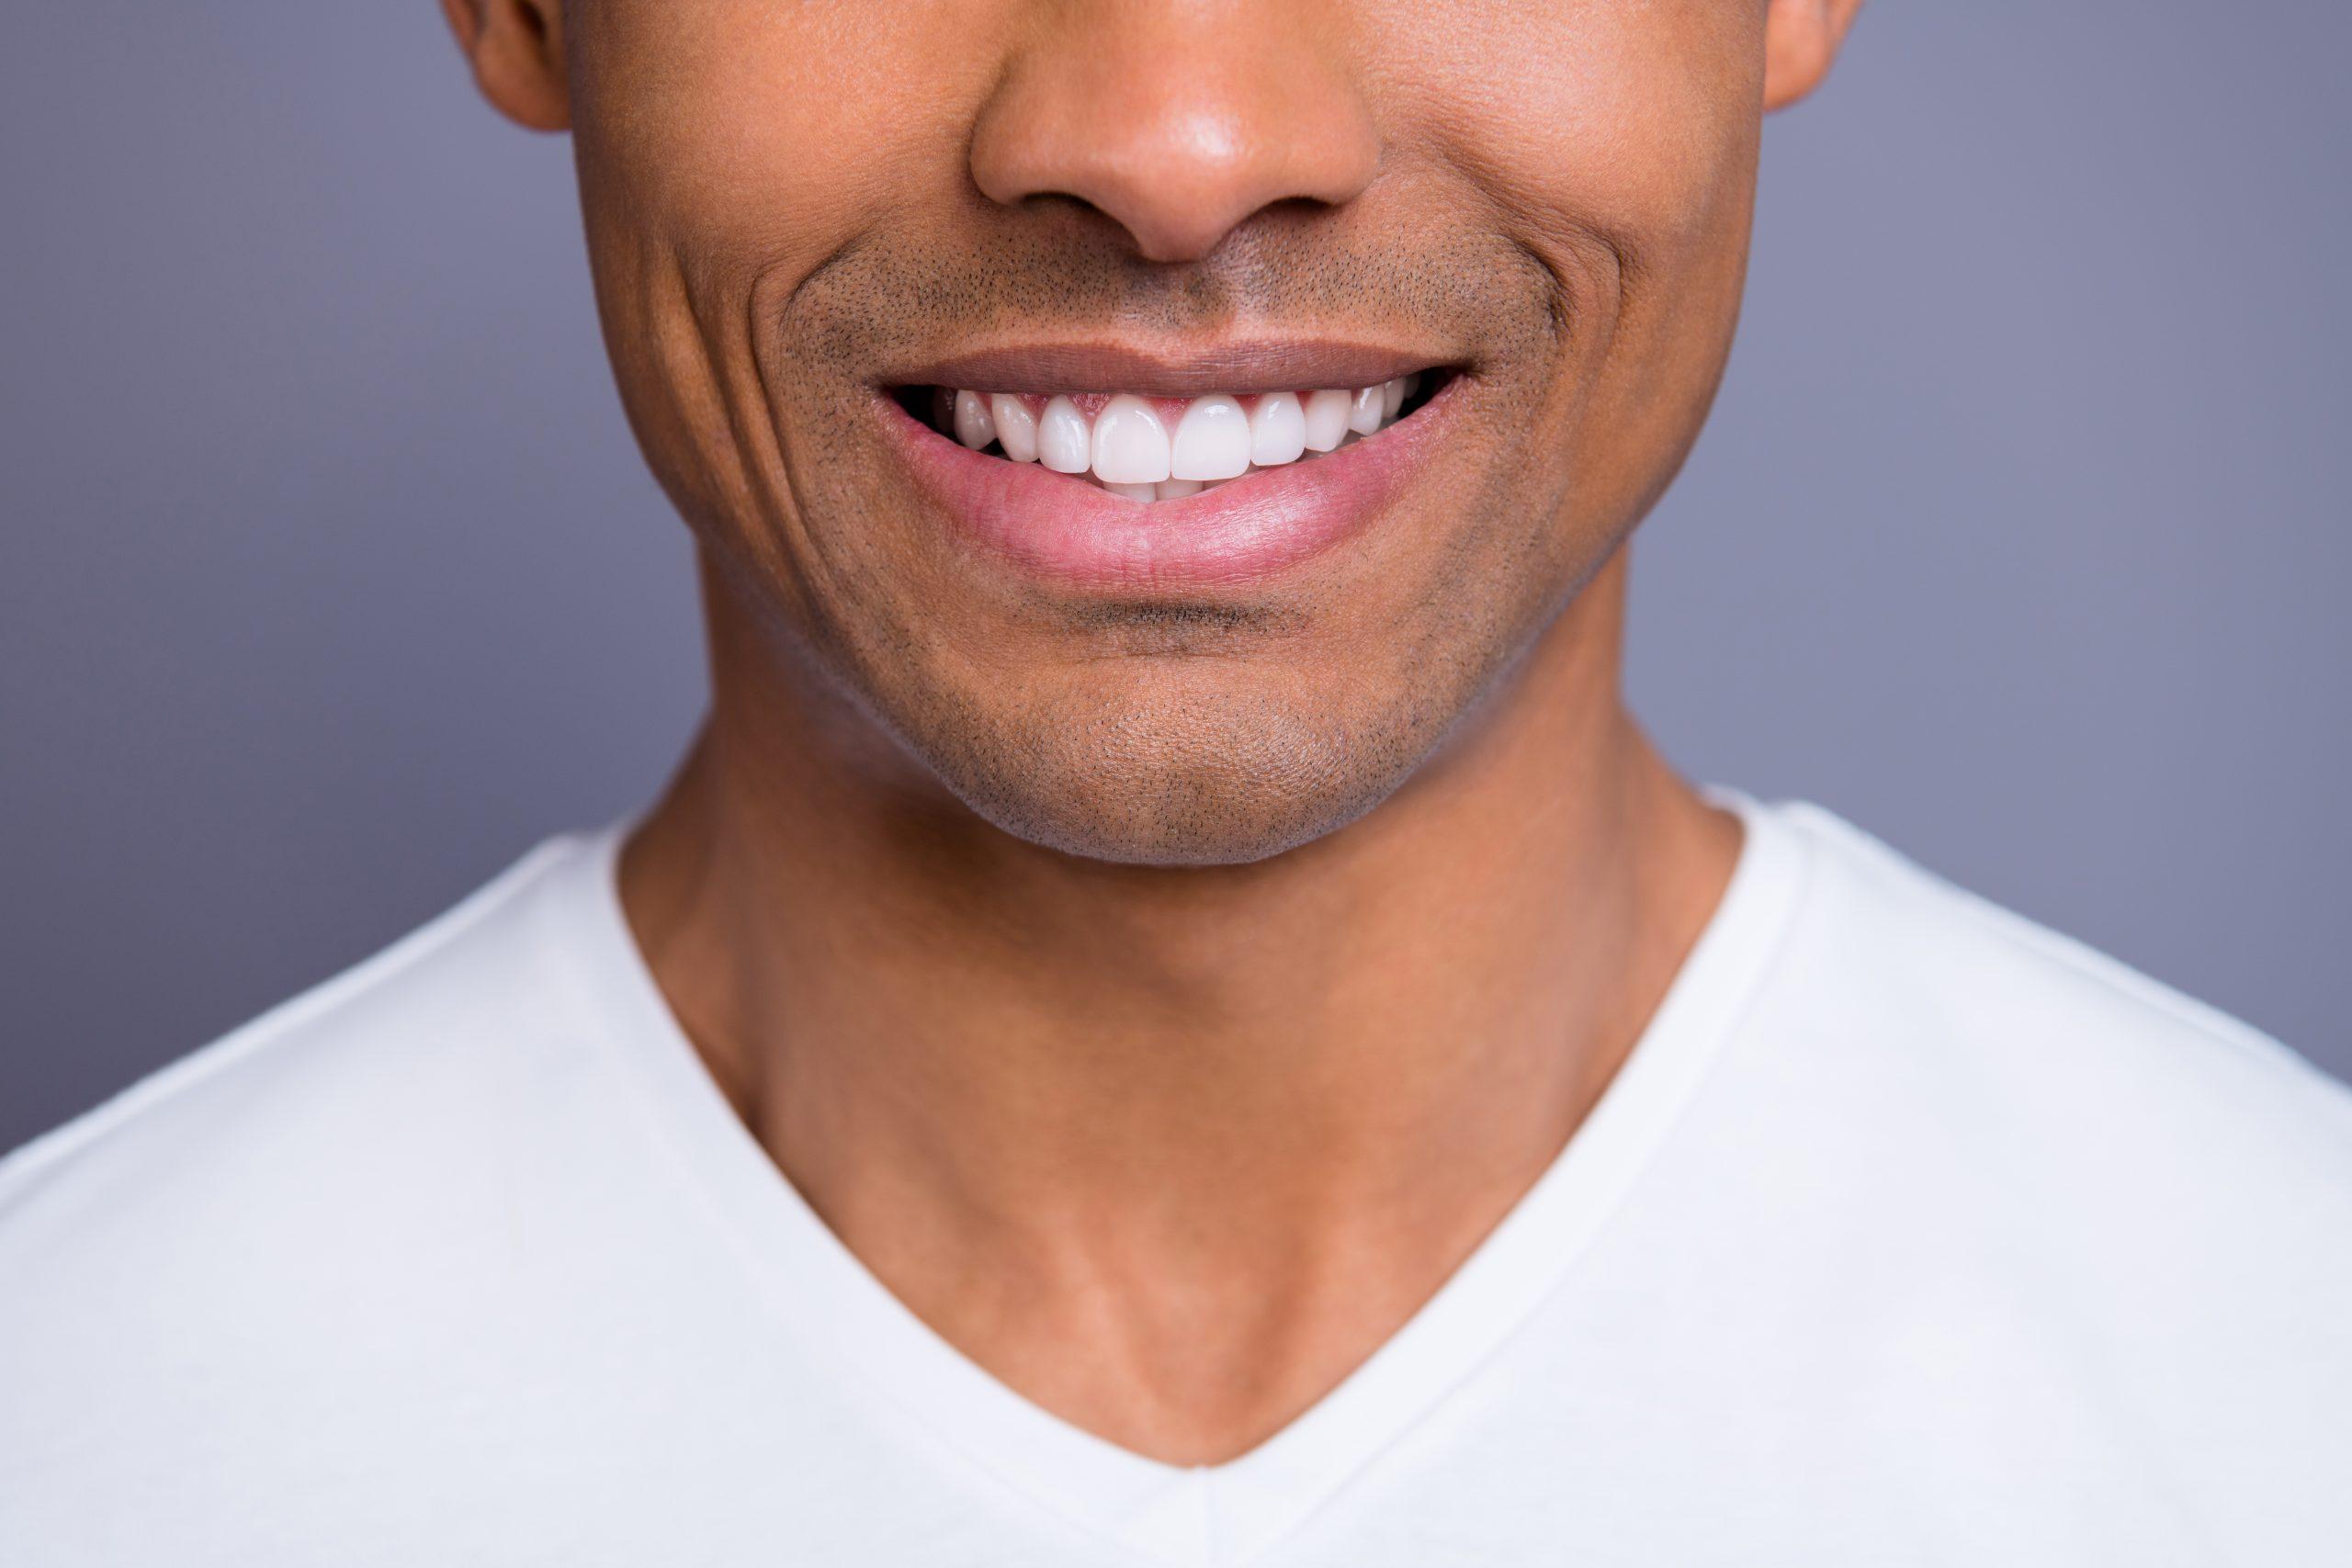 Man smiling to show gum bleaching.